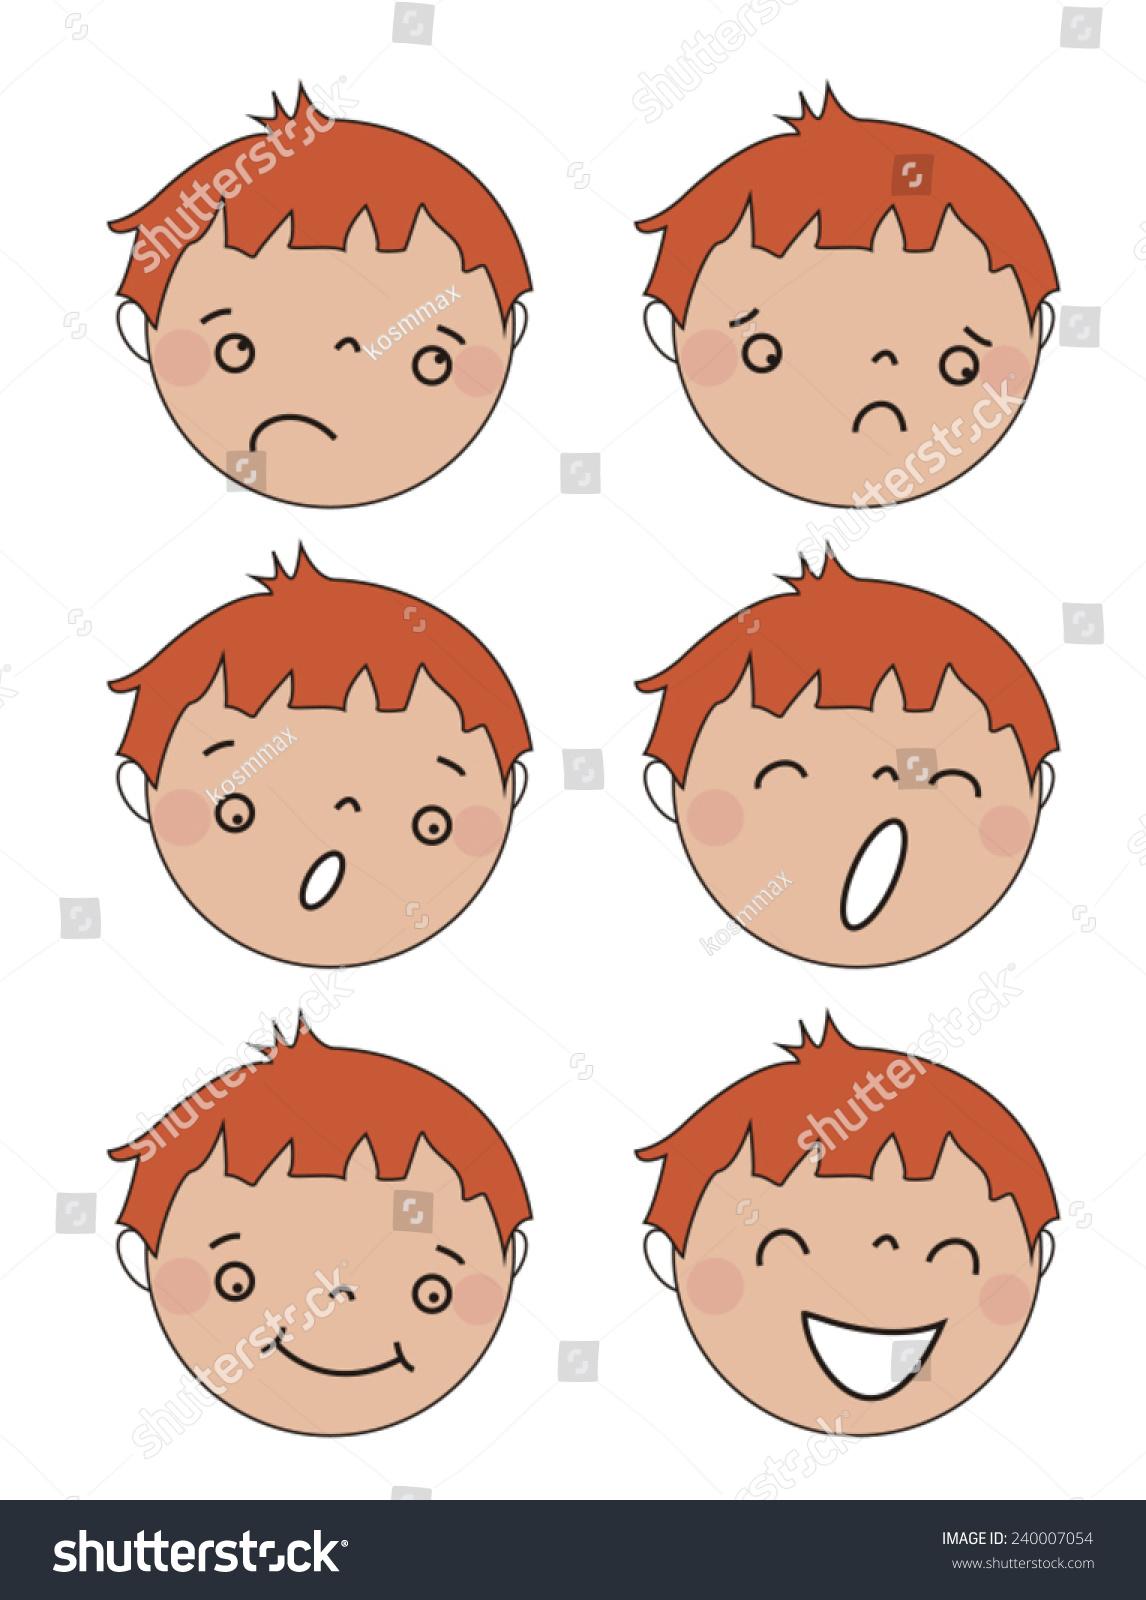 Funny Cartoon Images Of Boys funny cartoon faces vector boys stock vector (royalty free